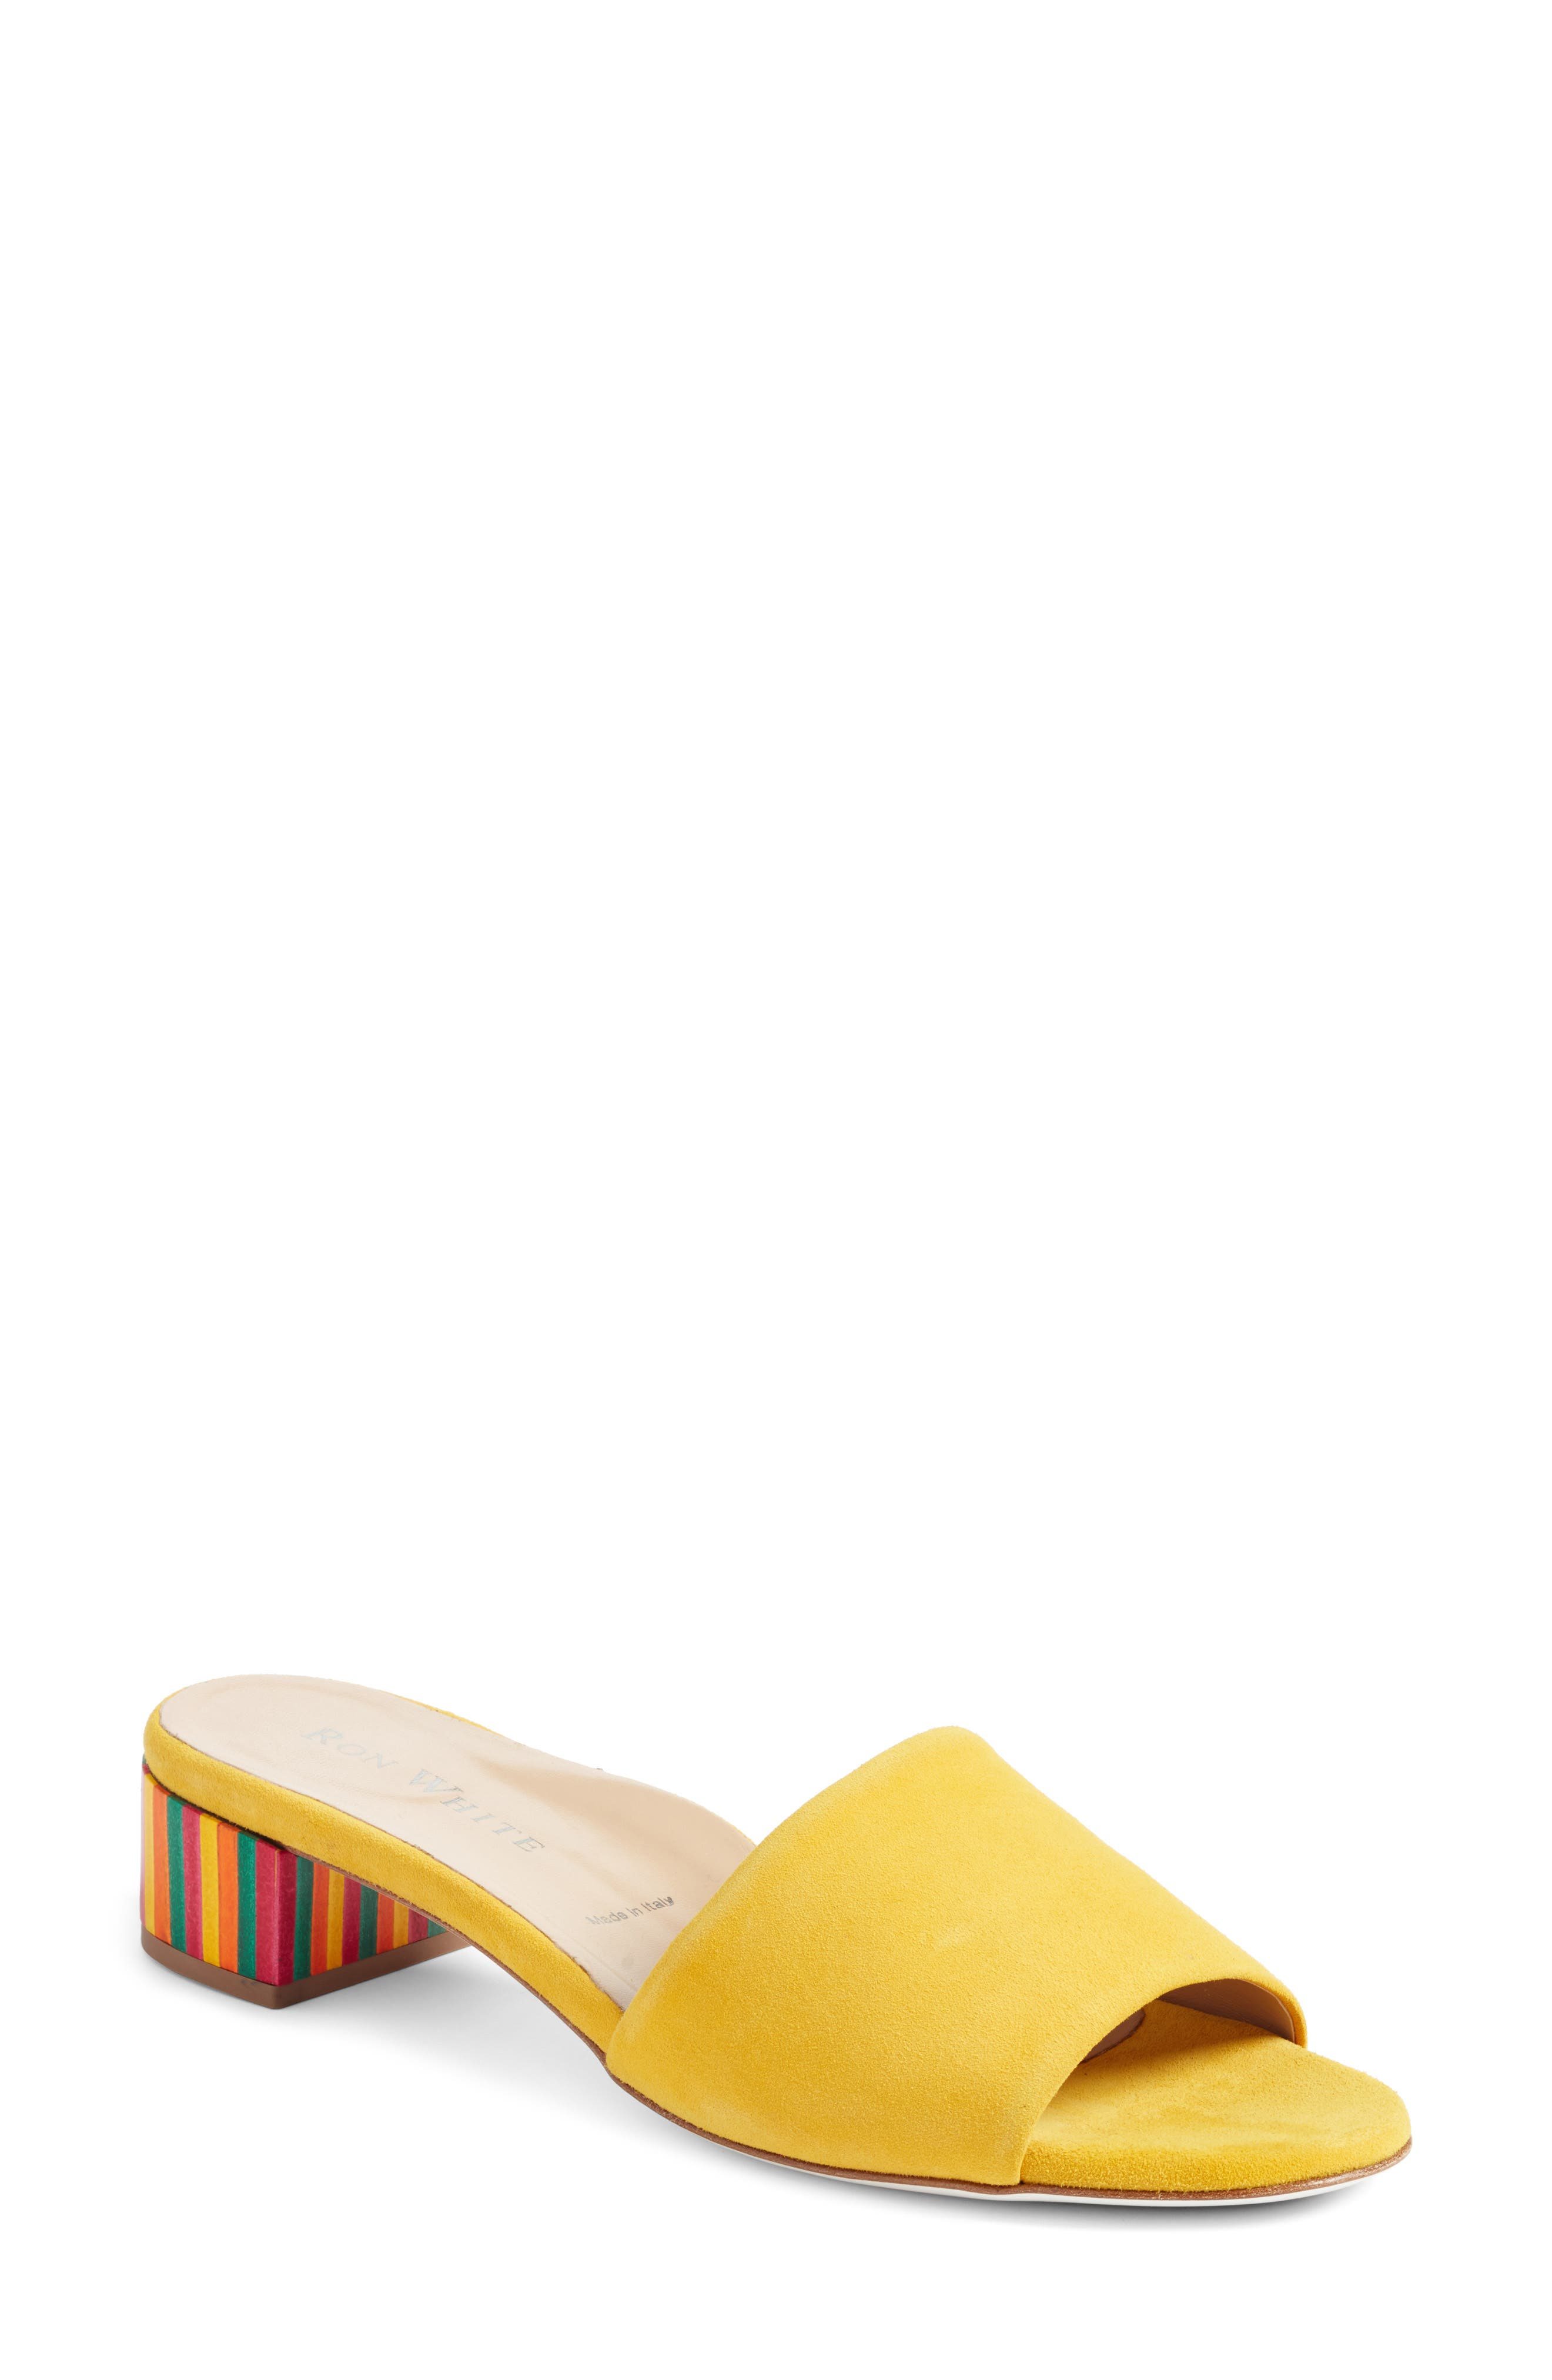 Esmarie Slide Sandal,                         Main,                         color, Lemon Suede